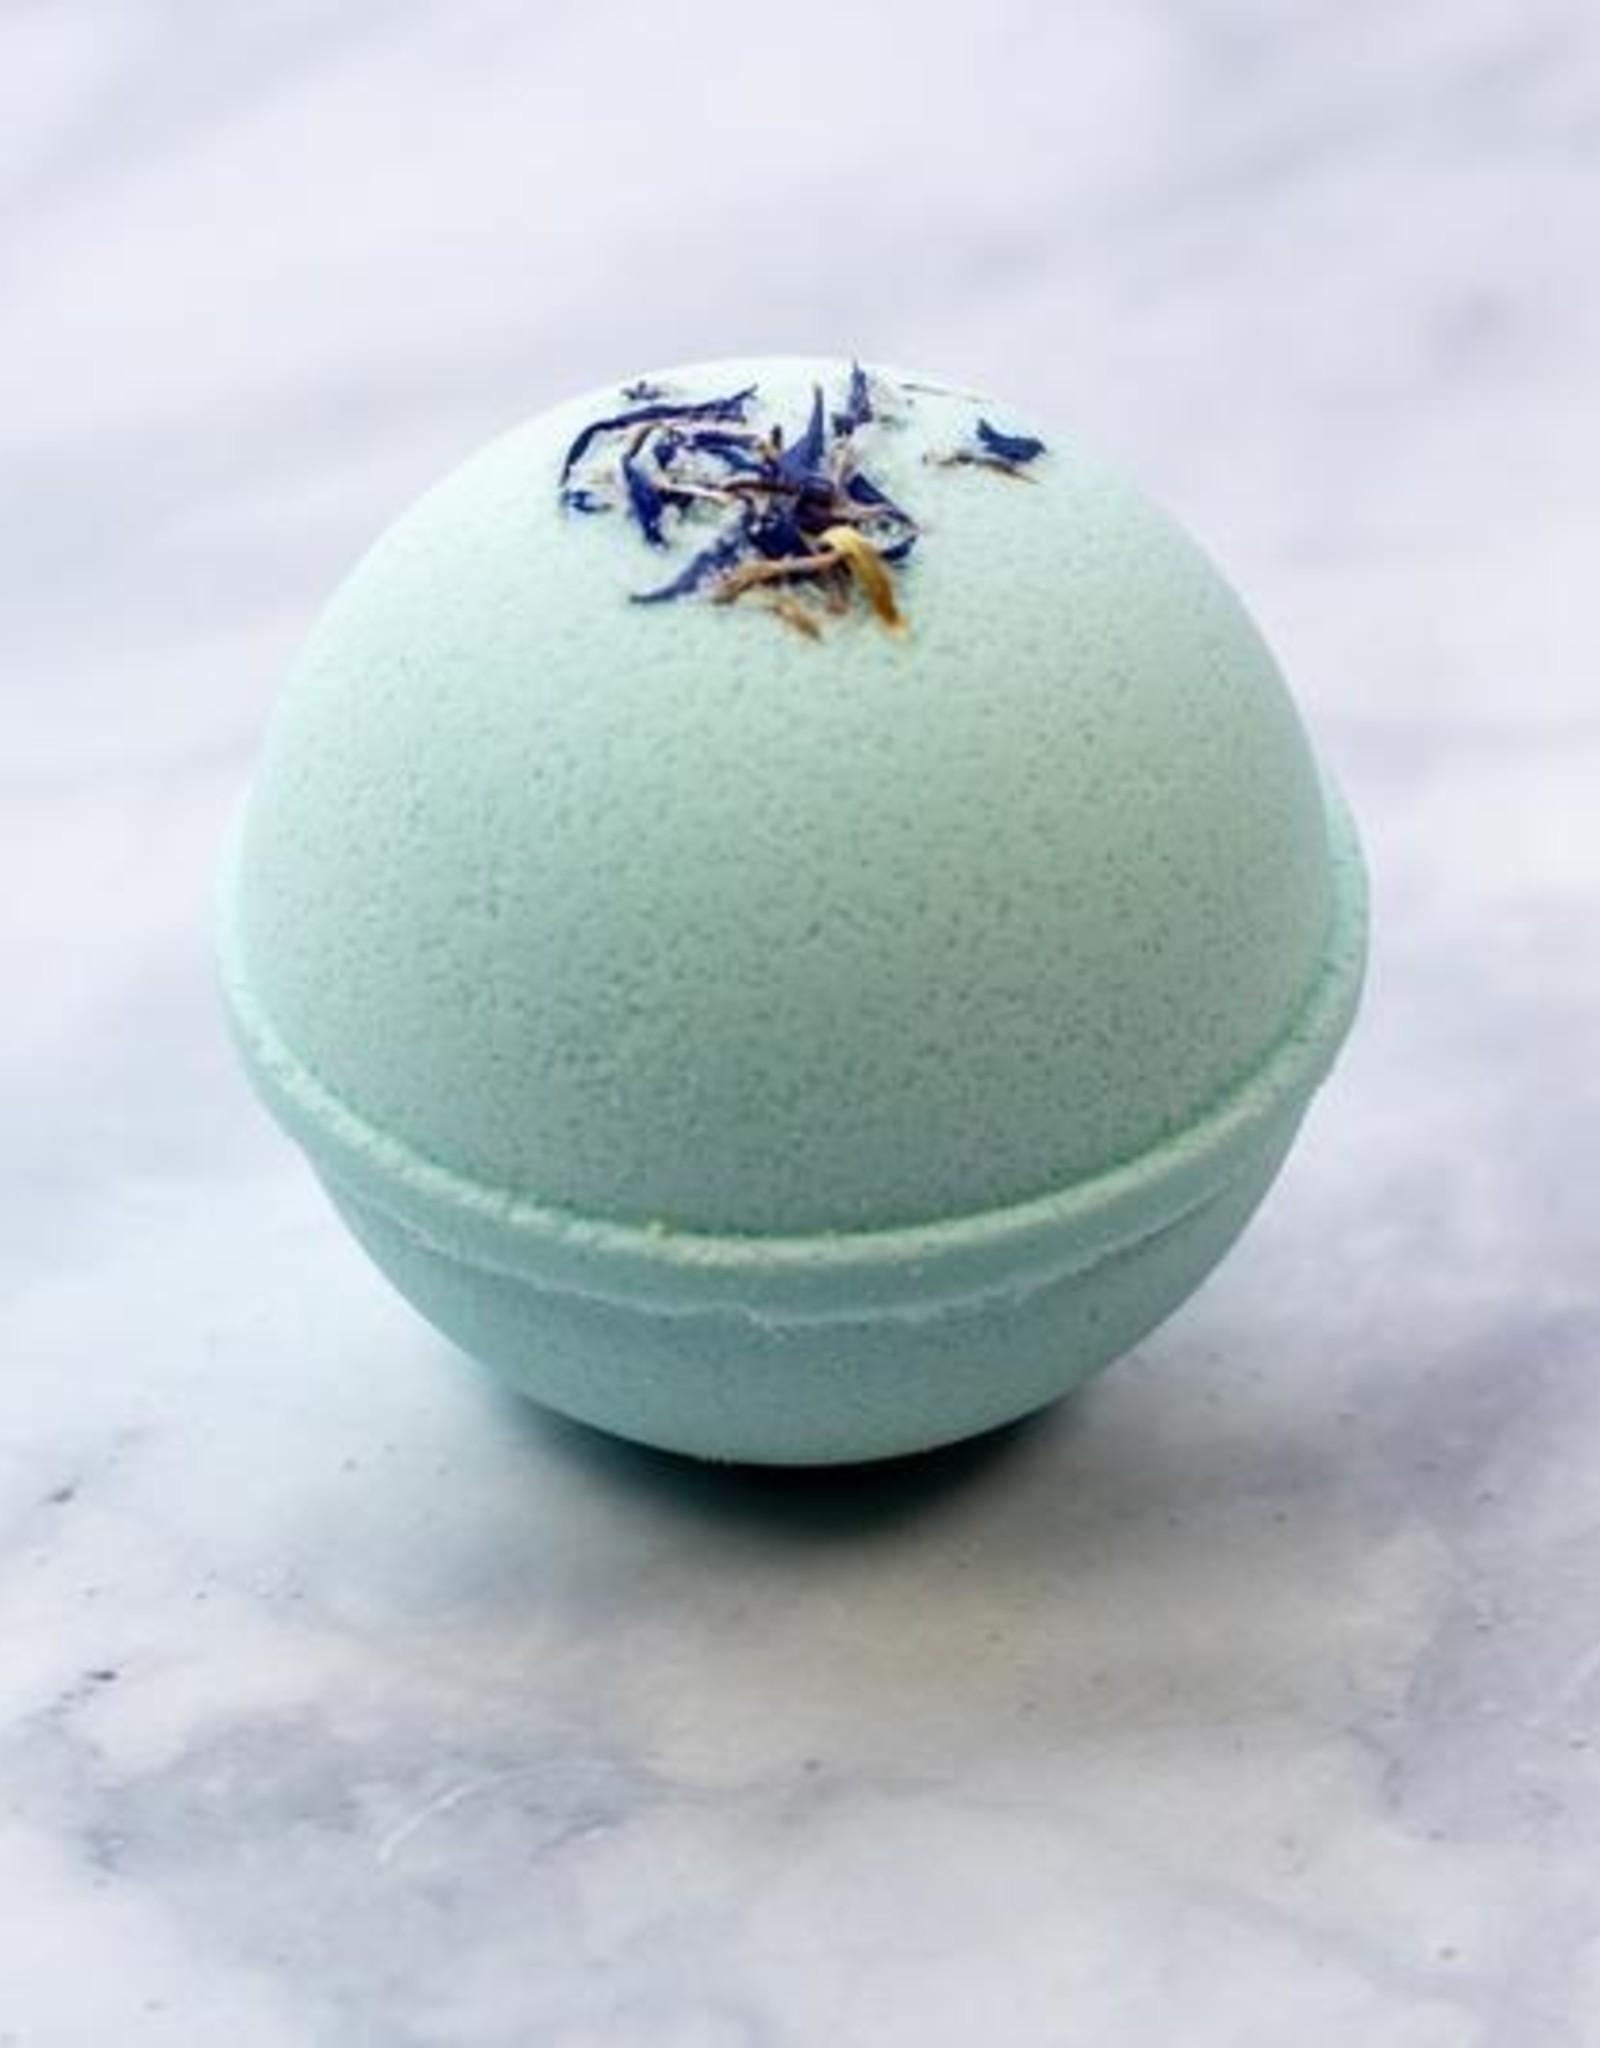 NaturalAmor Rose Cedarwood Bath Bomb